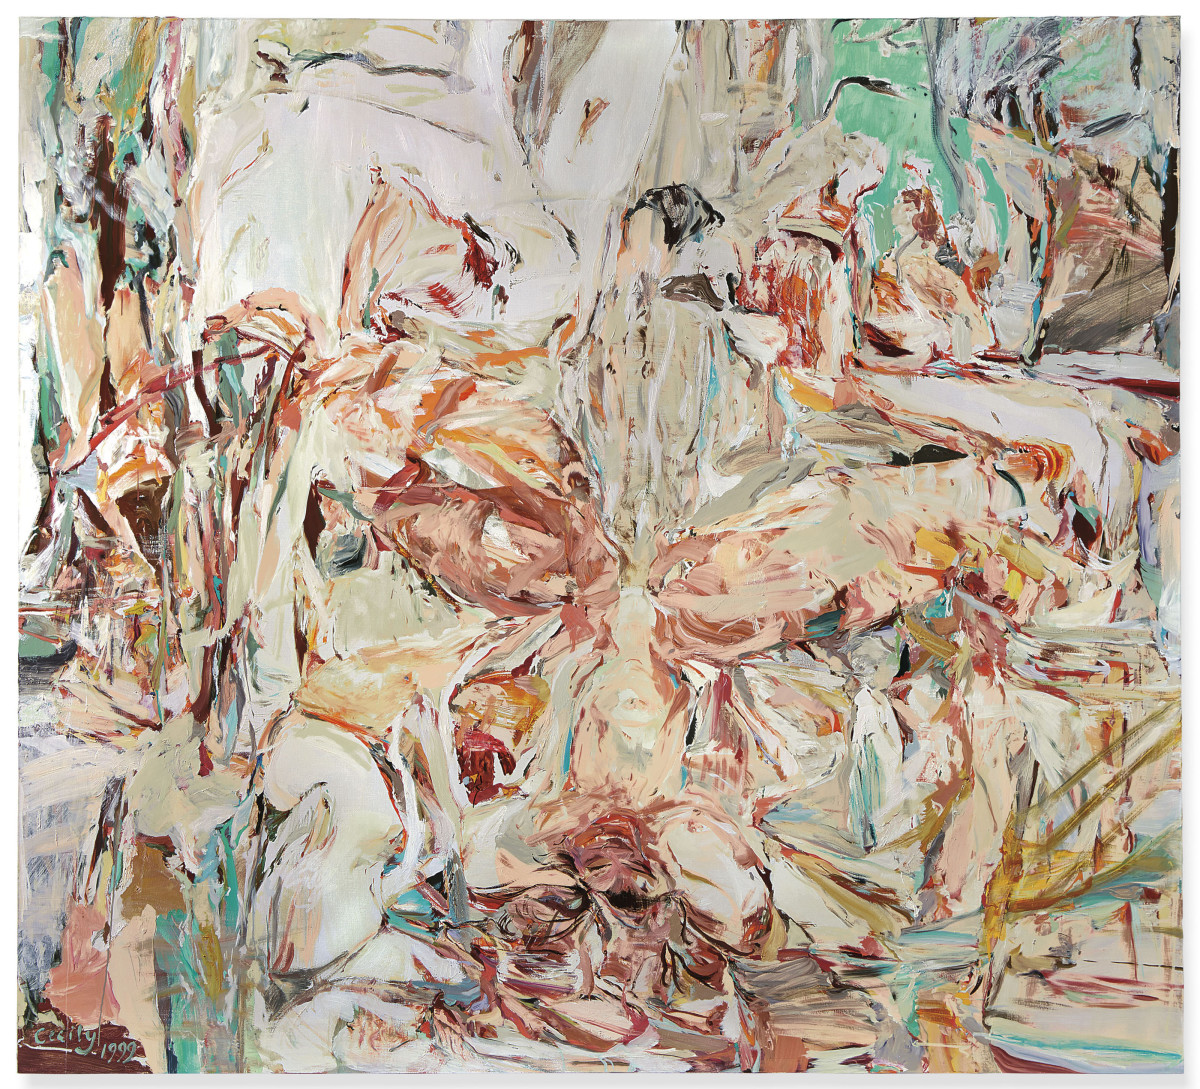 Christie's Lot 11 - Cecily Brown, Night Passage_artgorgeous